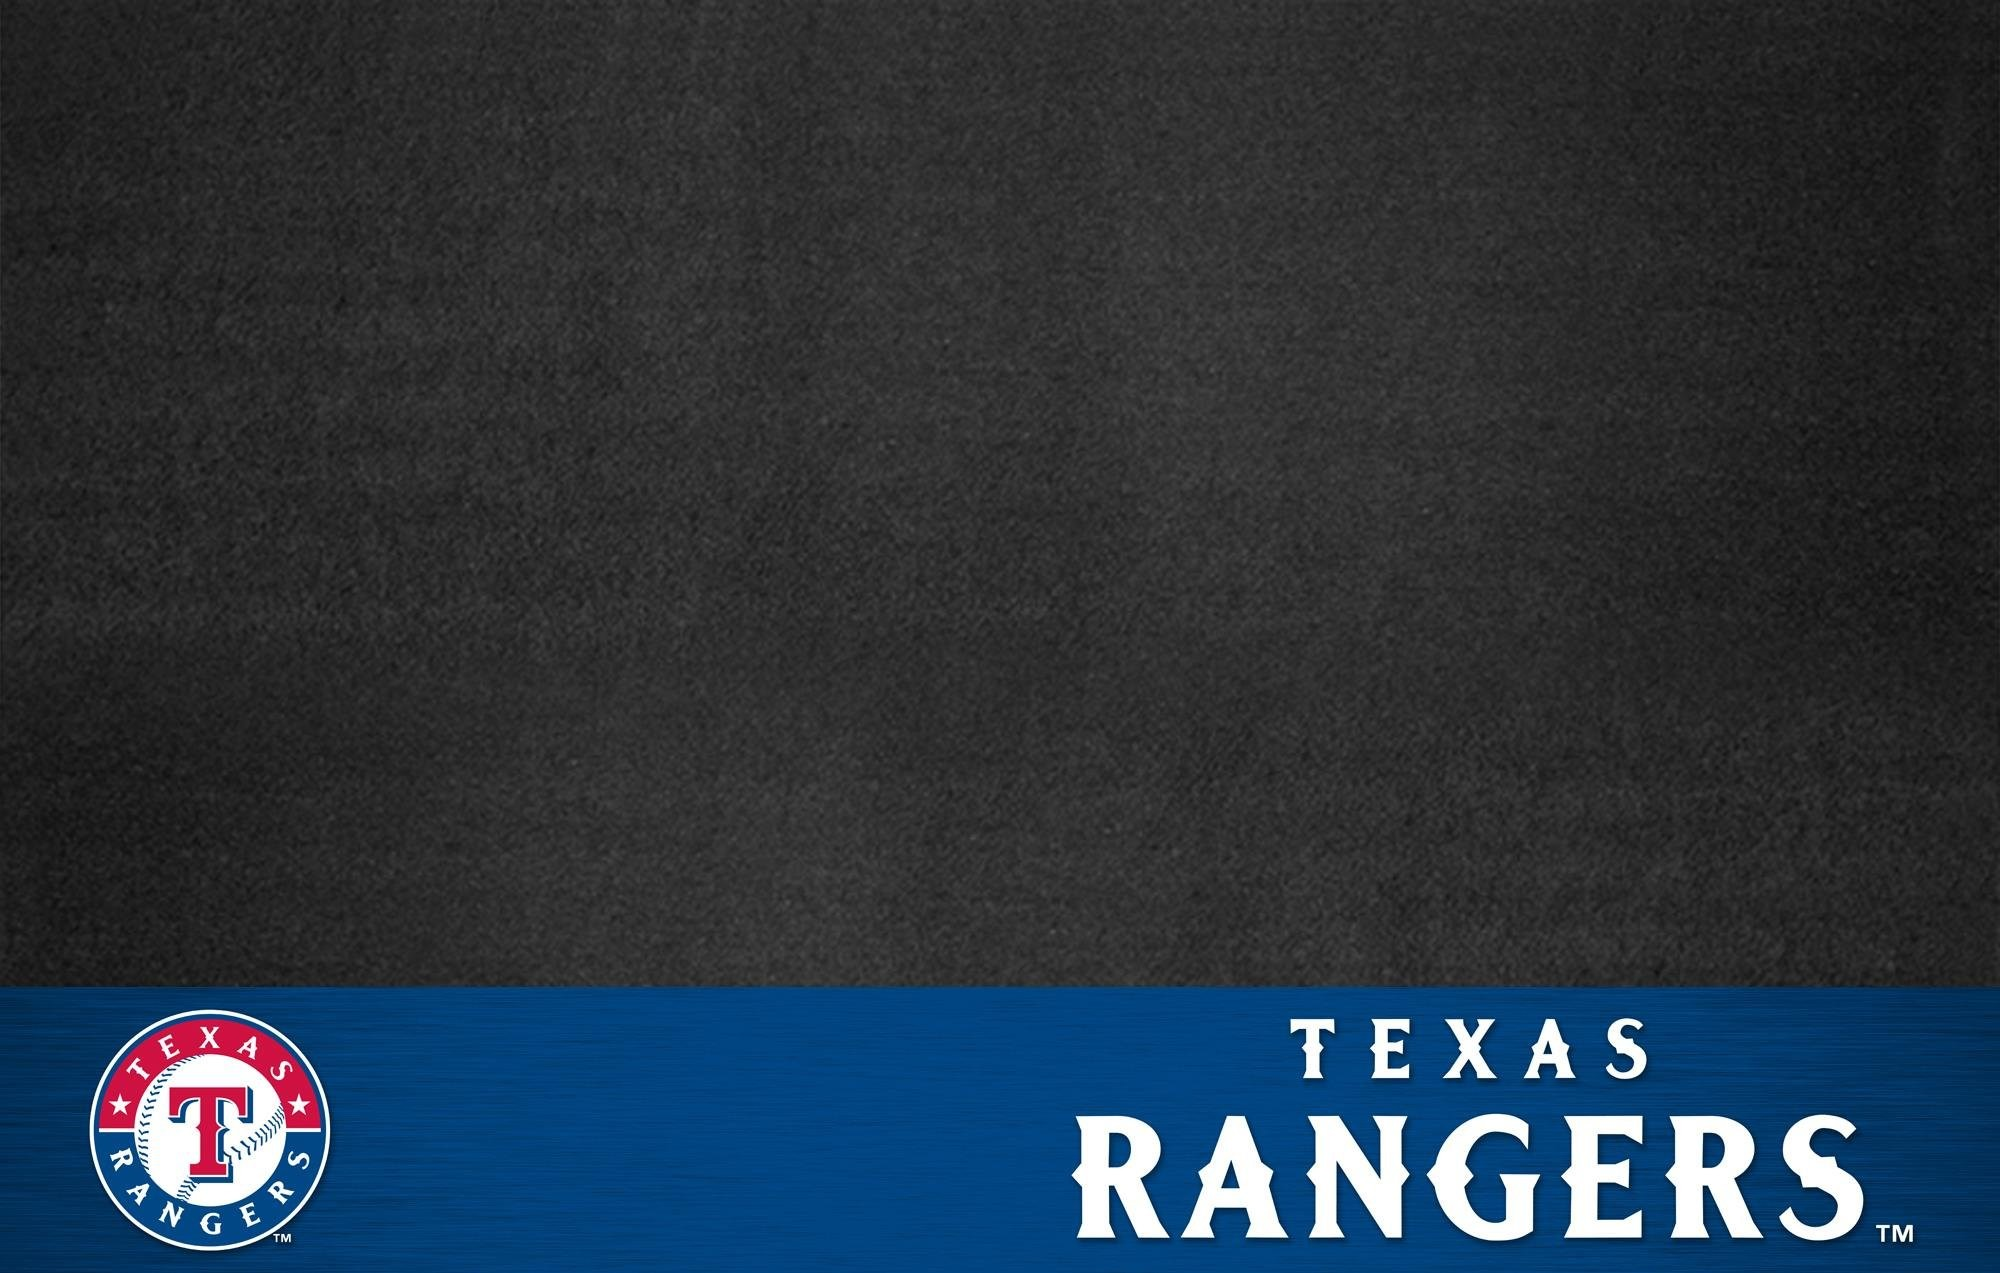 Texas Rangers iPhone Wallpapers (24 Wallpapers)